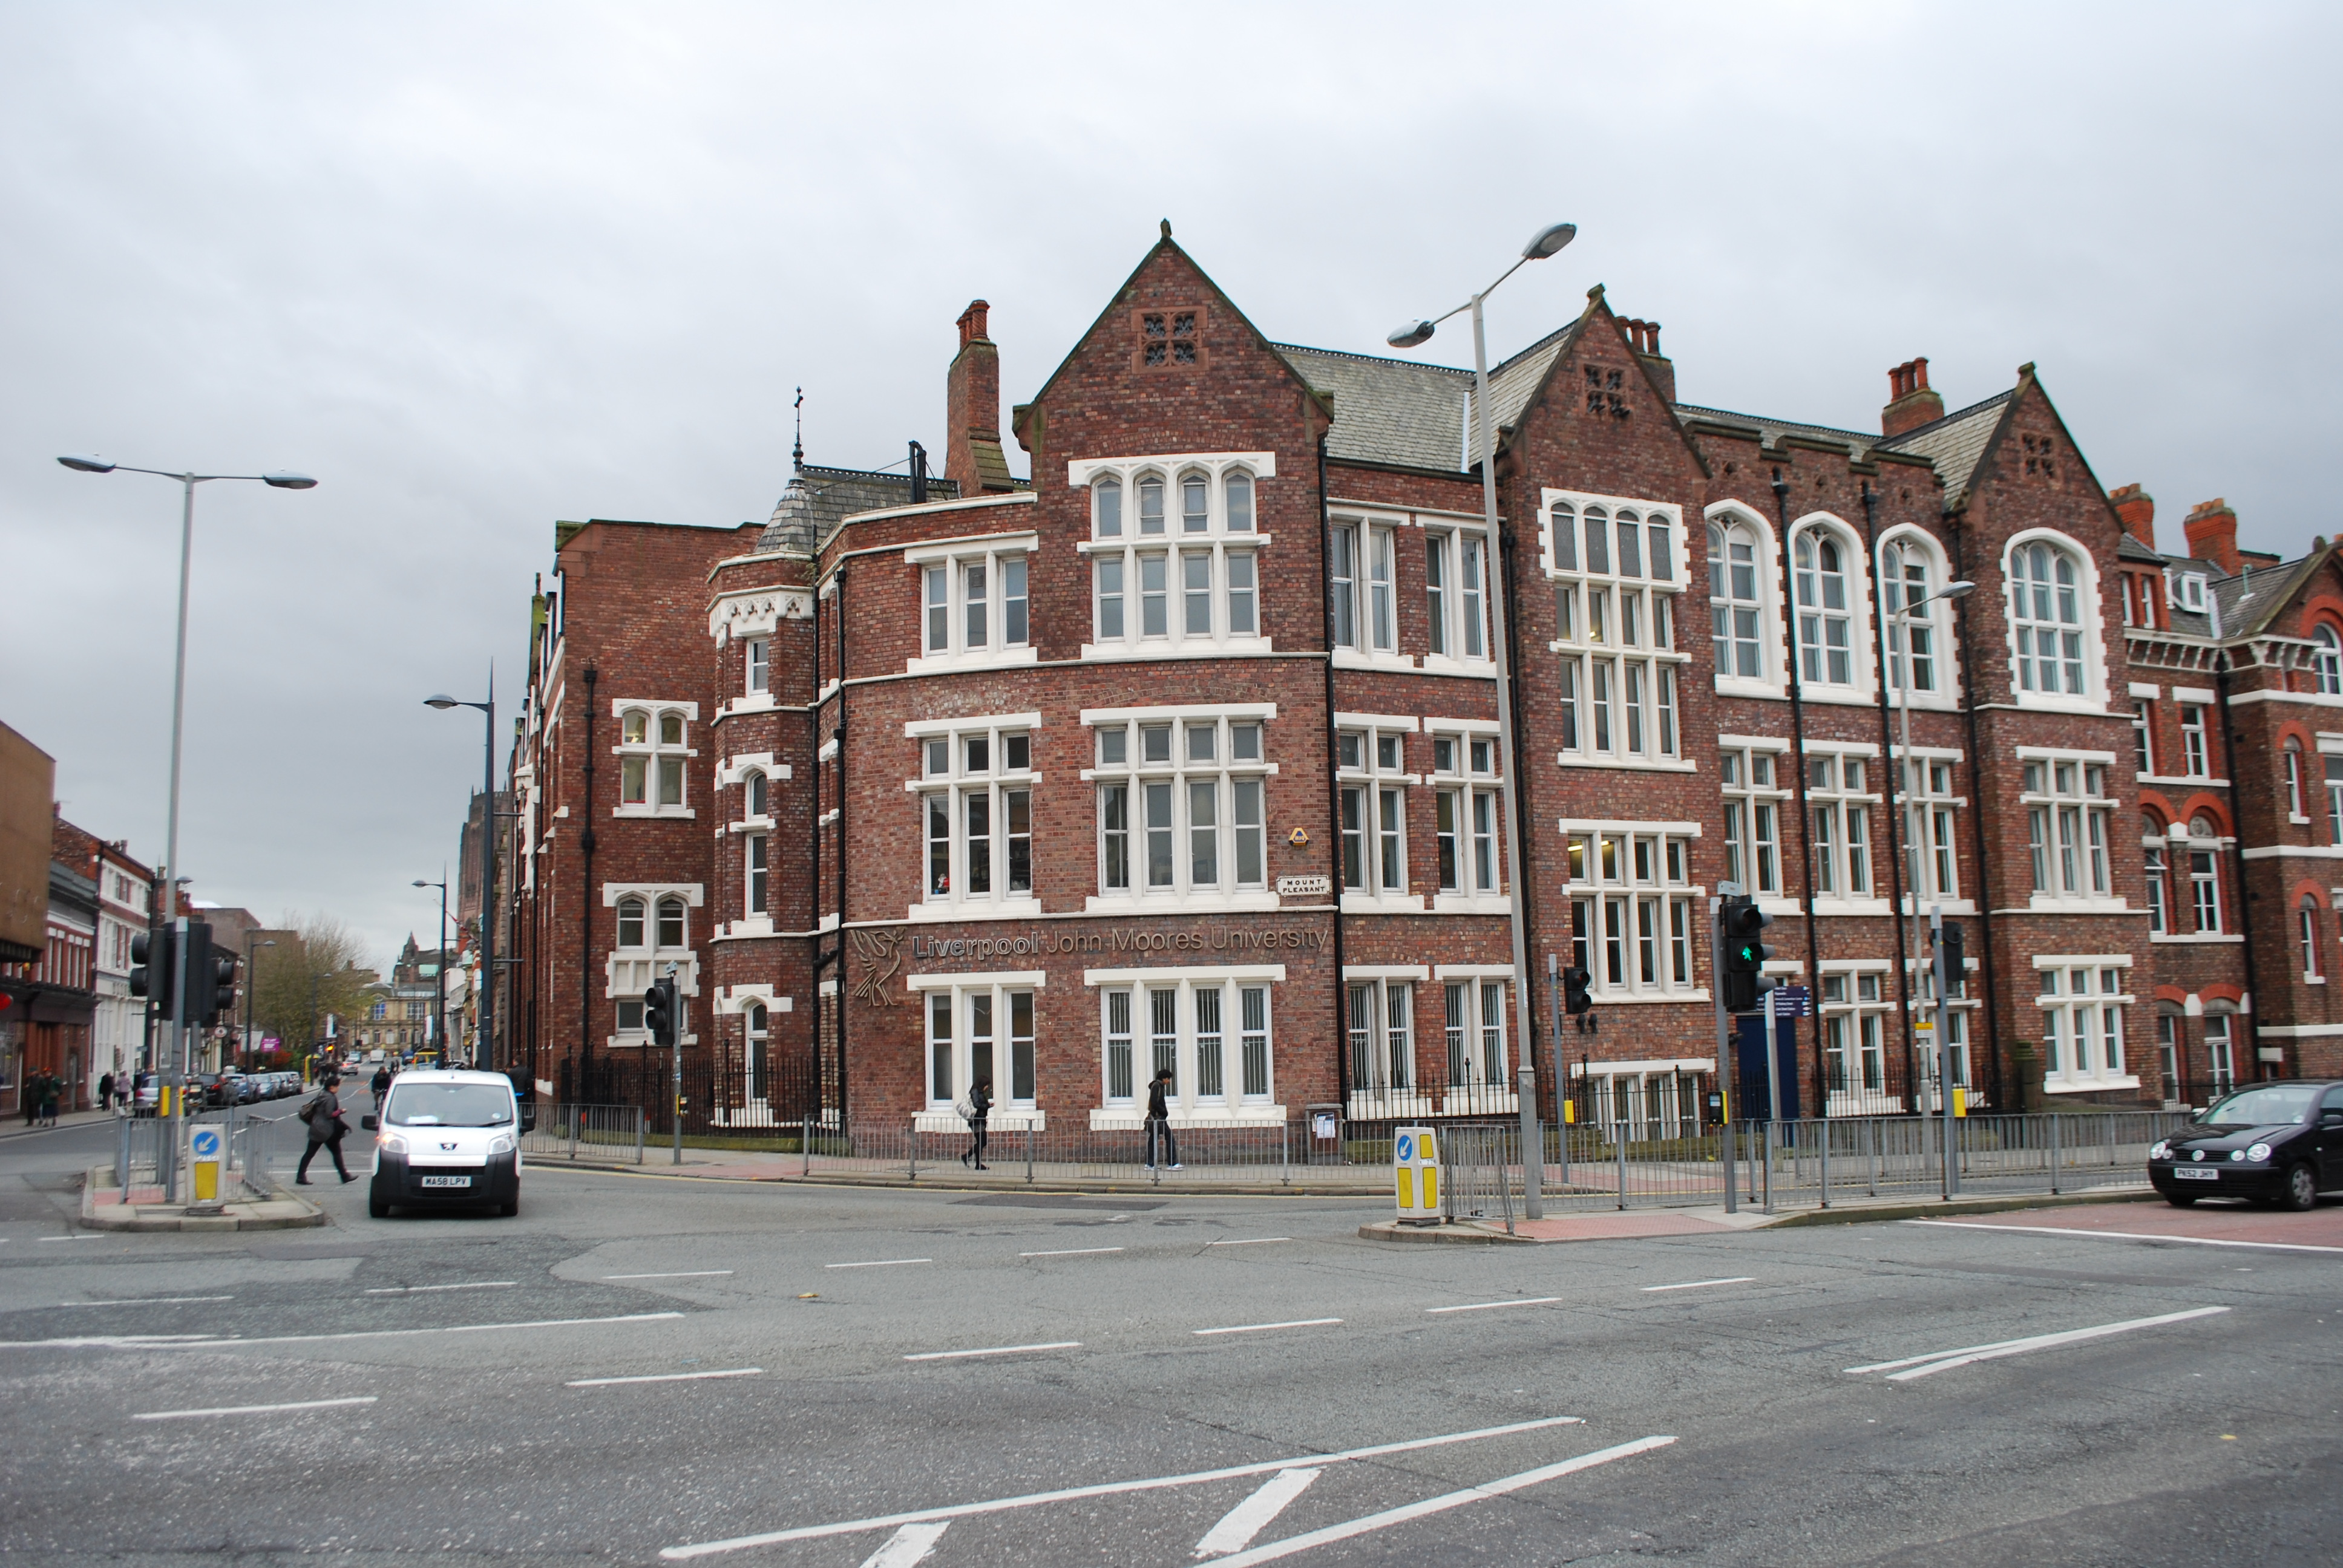 Uni Of Liverpool Sydney Jones Book A Room